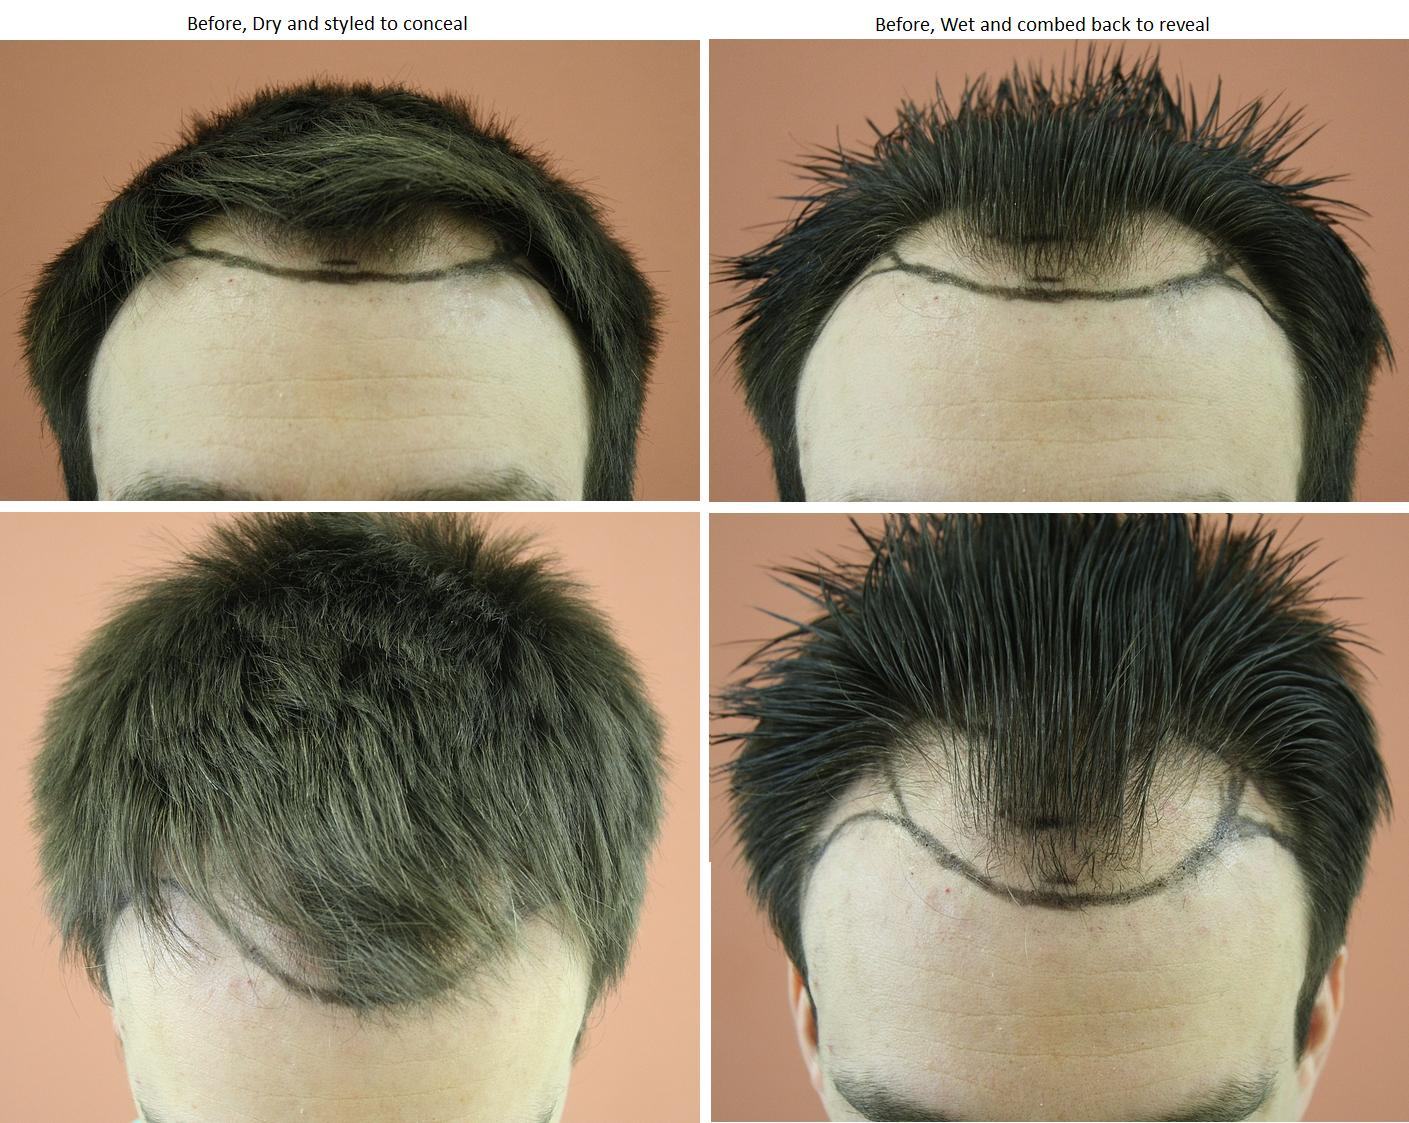 international hair loss forum dr bisanga 2927 fue 0 12 mois. Black Bedroom Furniture Sets. Home Design Ideas